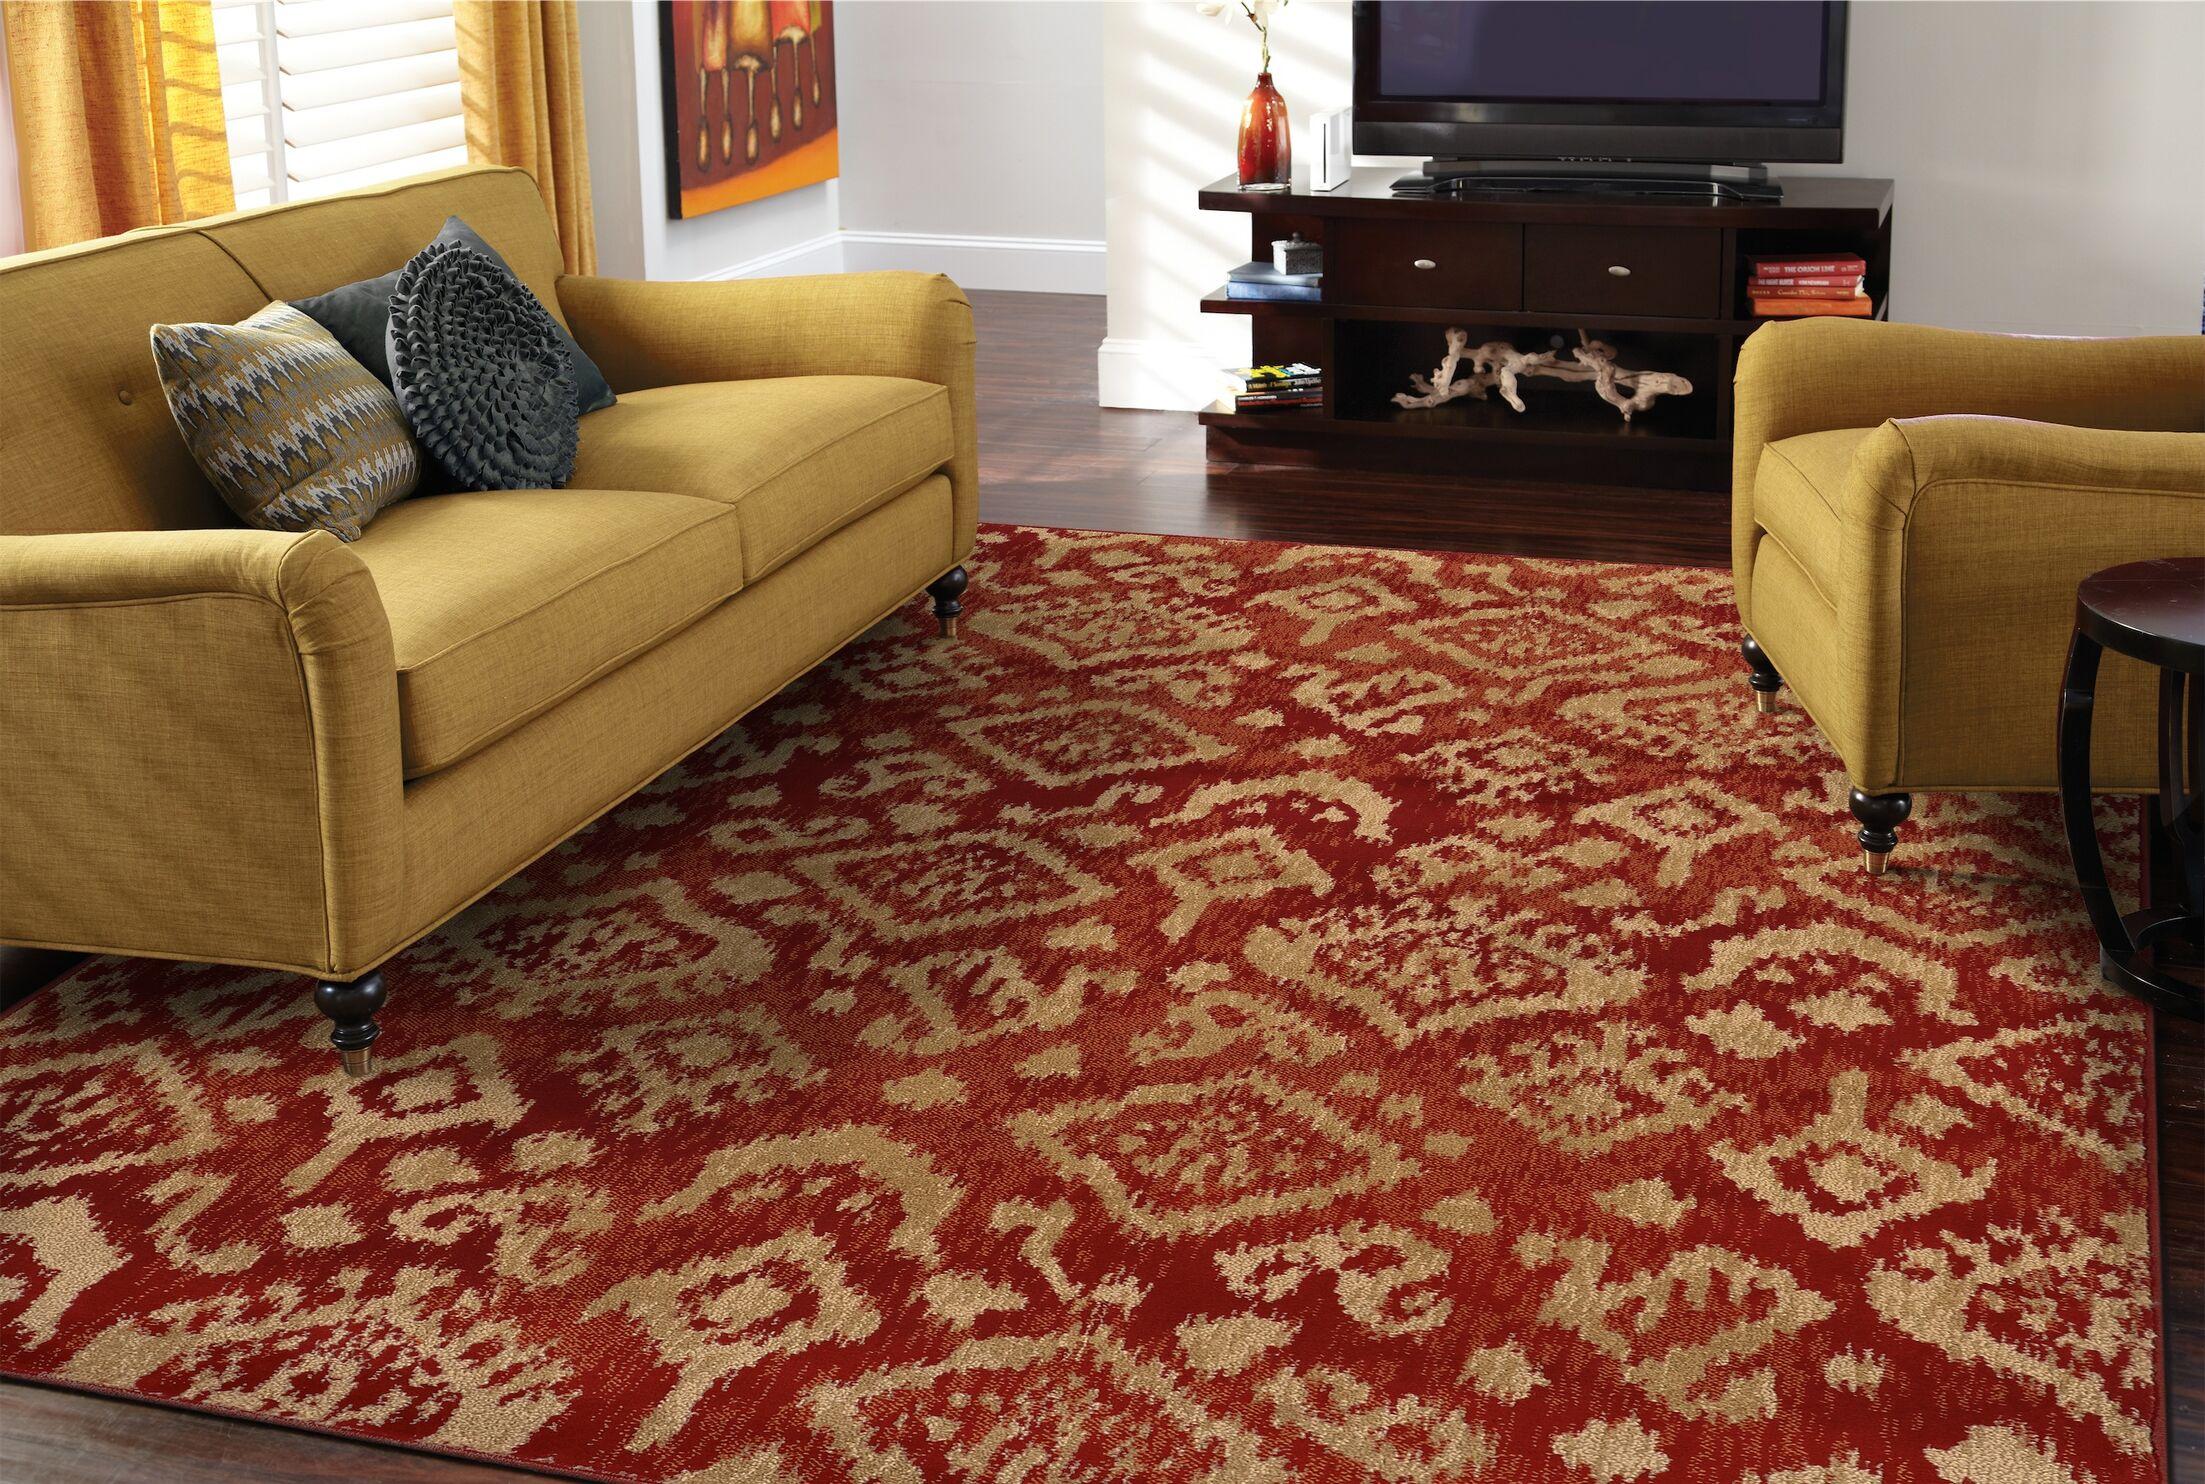 Sonora Red/Beige Area Rug Rug Size: Runner 1'1 x 7'6